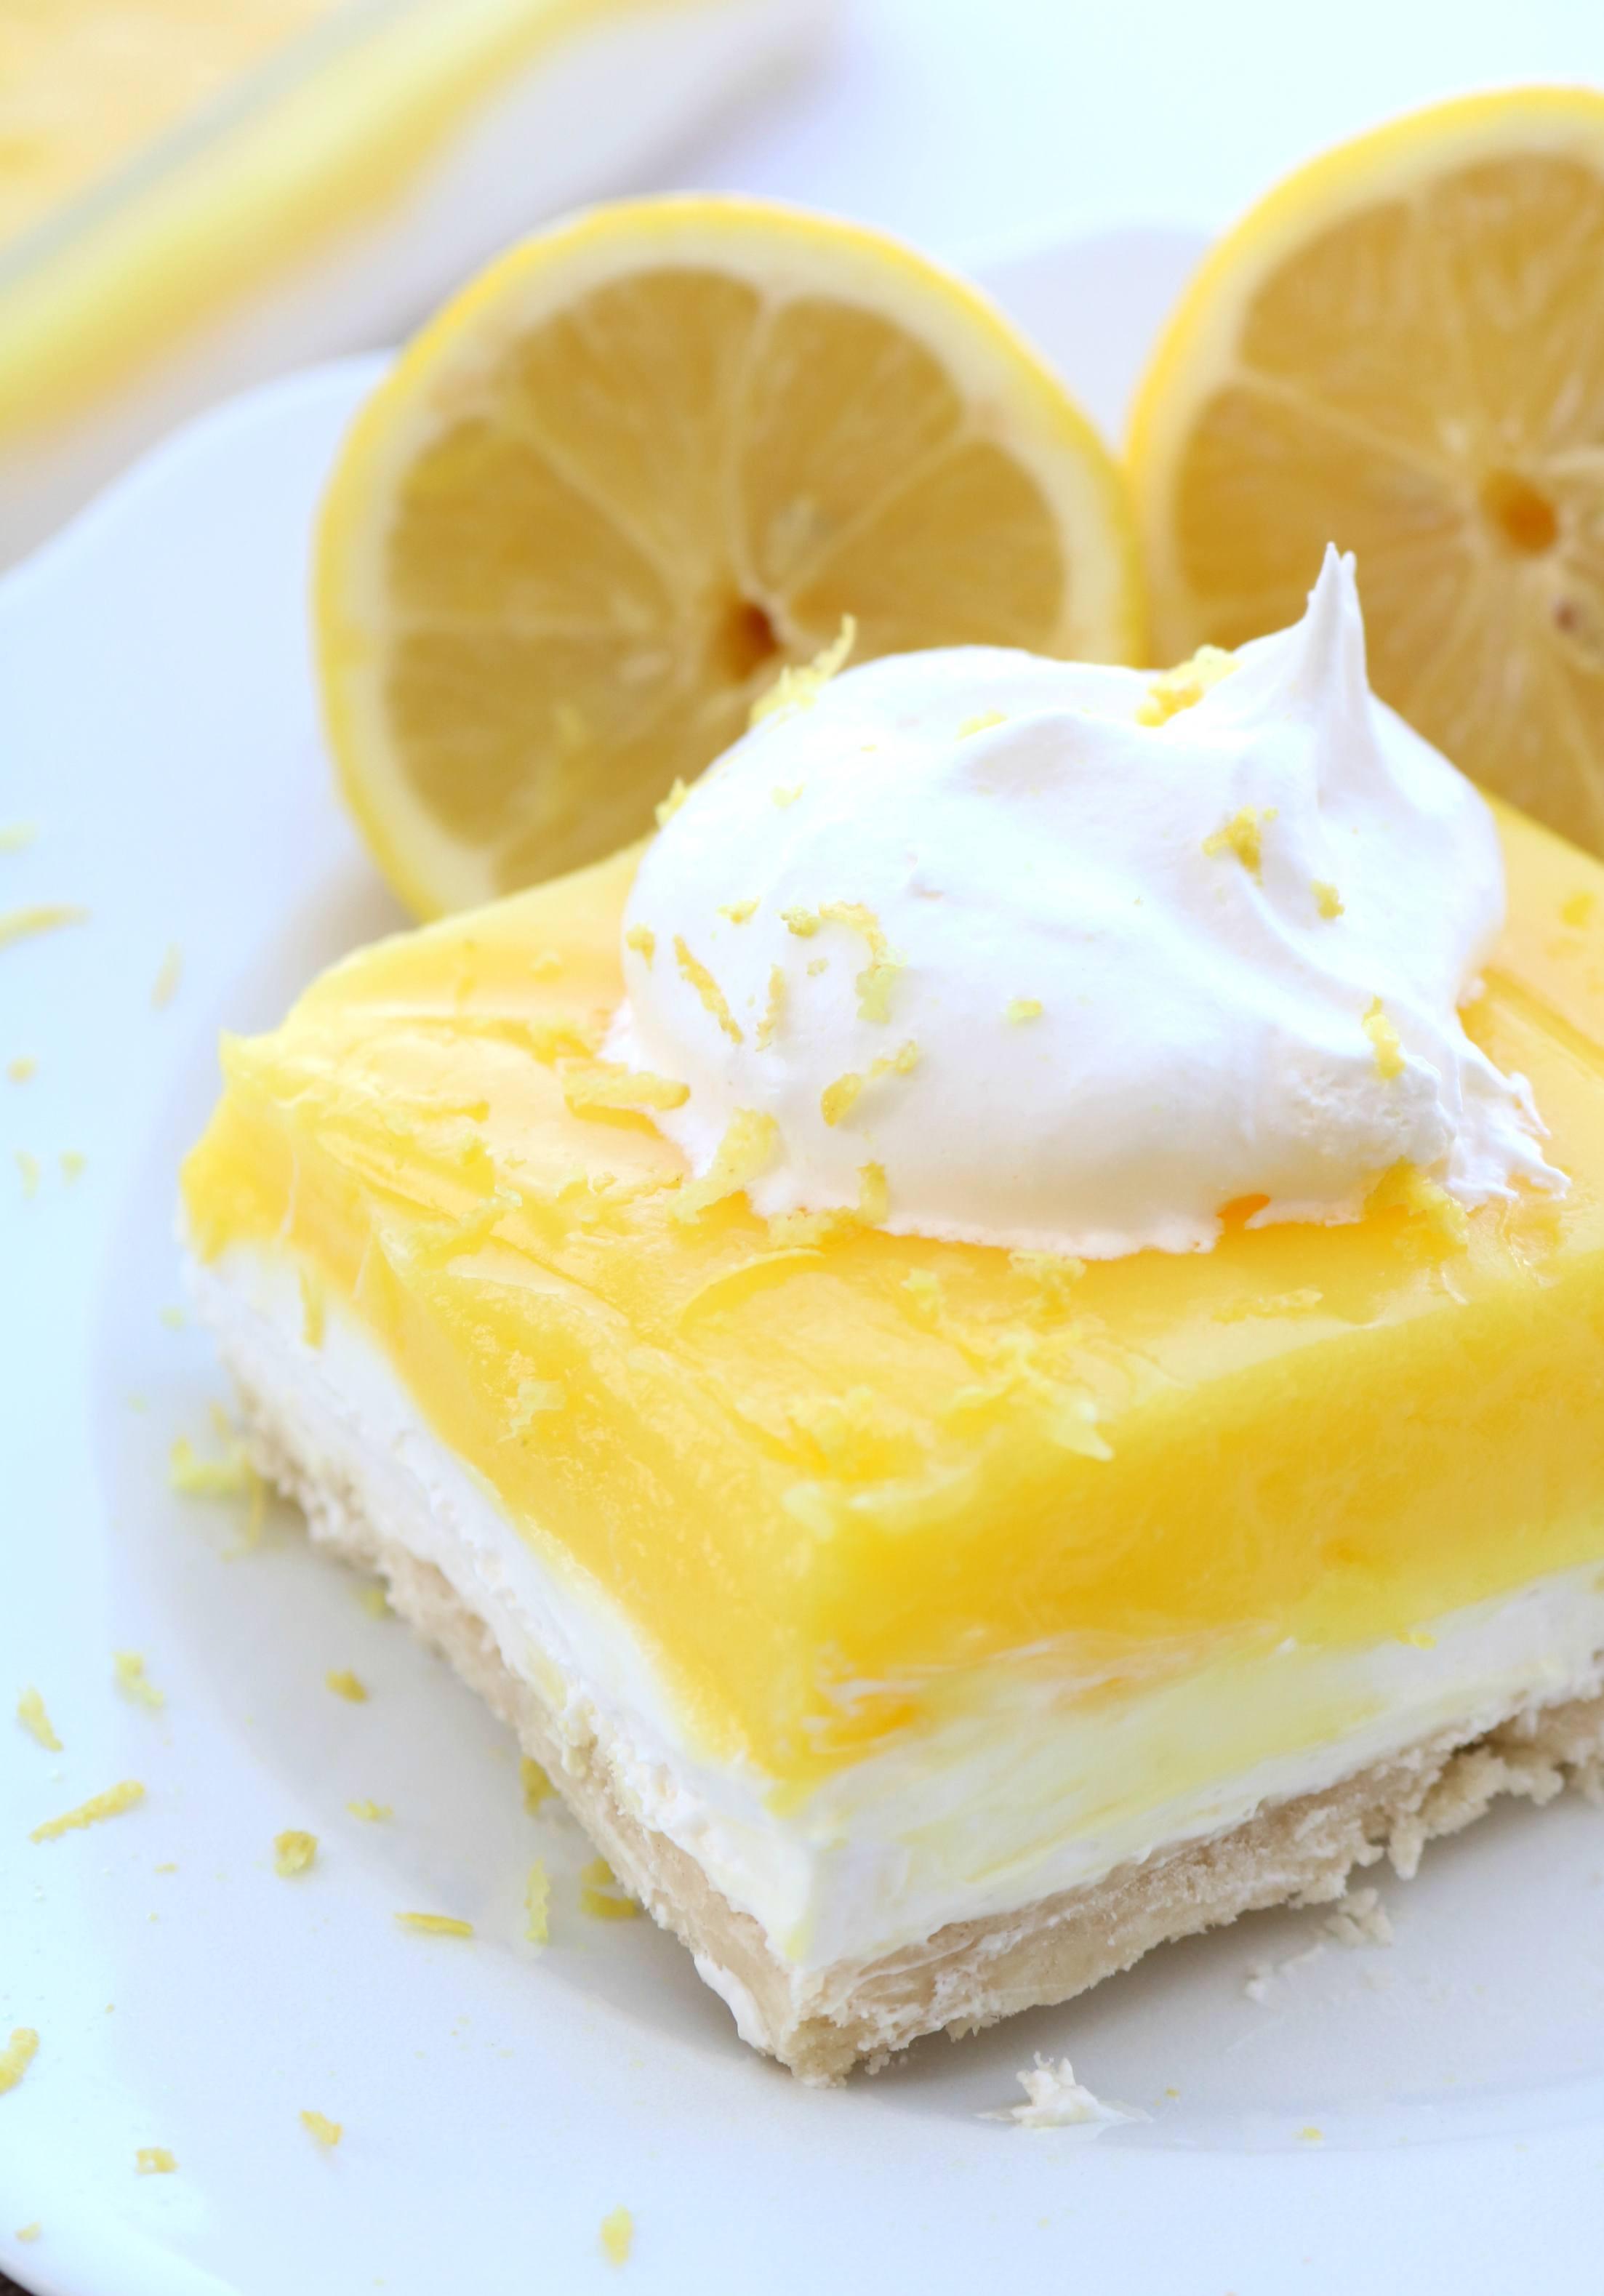 Layered Lemon Dessert  Layered Lemon Dessert Sugar n Spice Gals